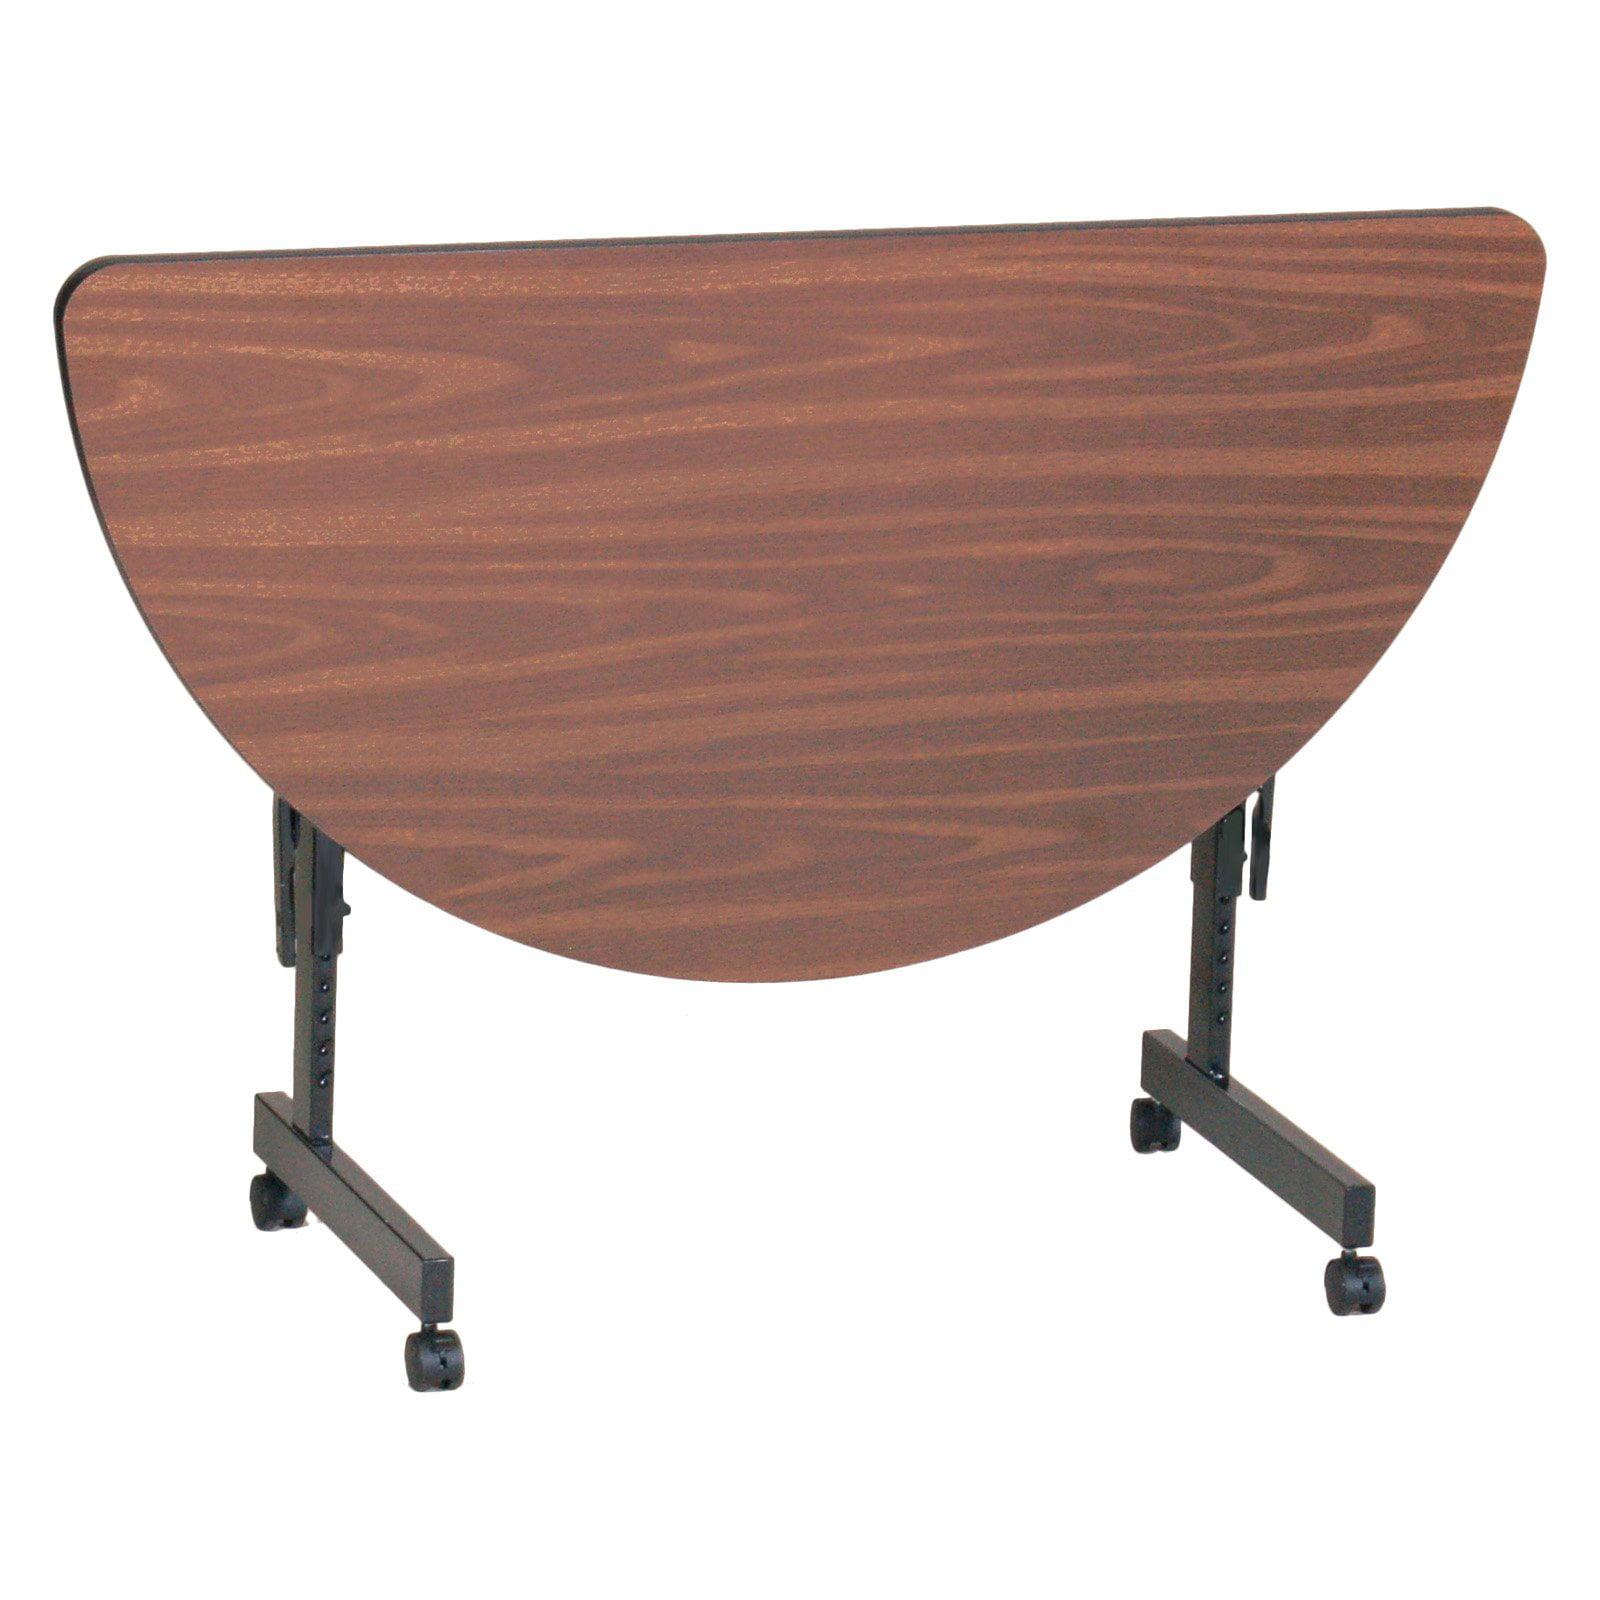 Correll EconoLine Flip Top Table - Melamine Top - 24x48 Half Round